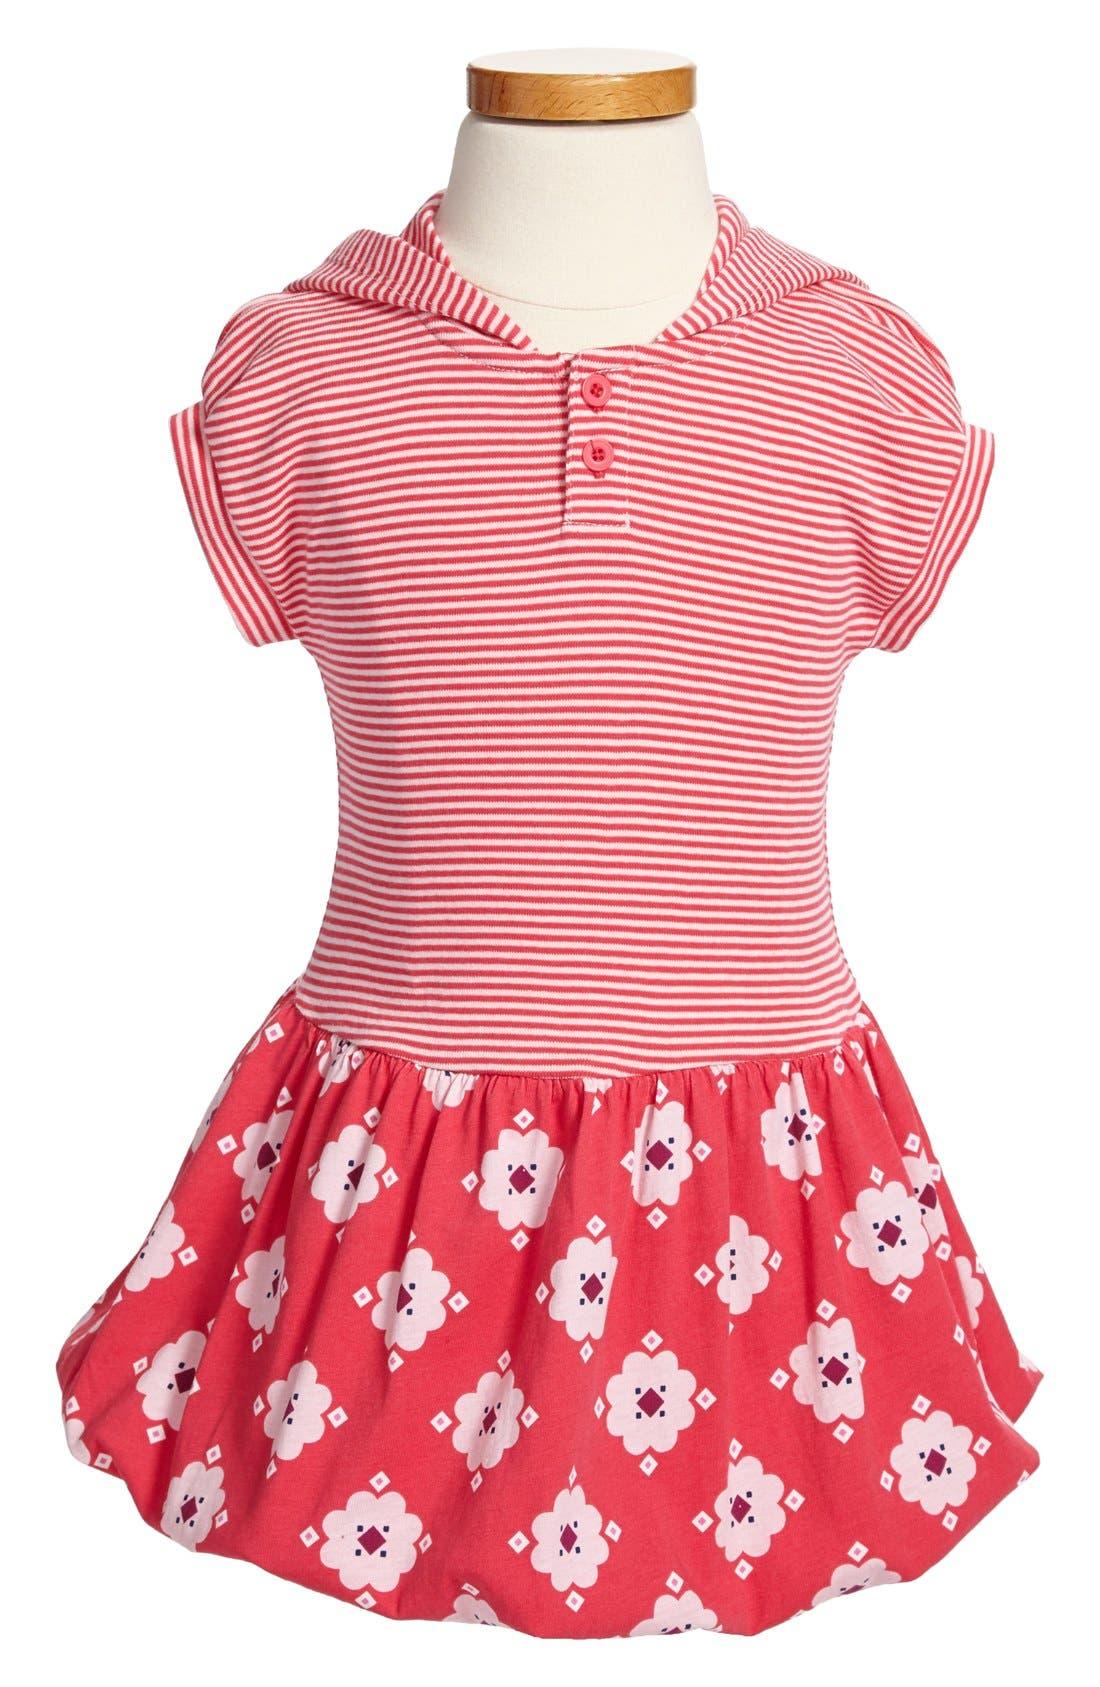 Alternate Image 1 Selected - Tea Collection 'Berber Floral' Bubble Dress (Little Girls & Big Girls)